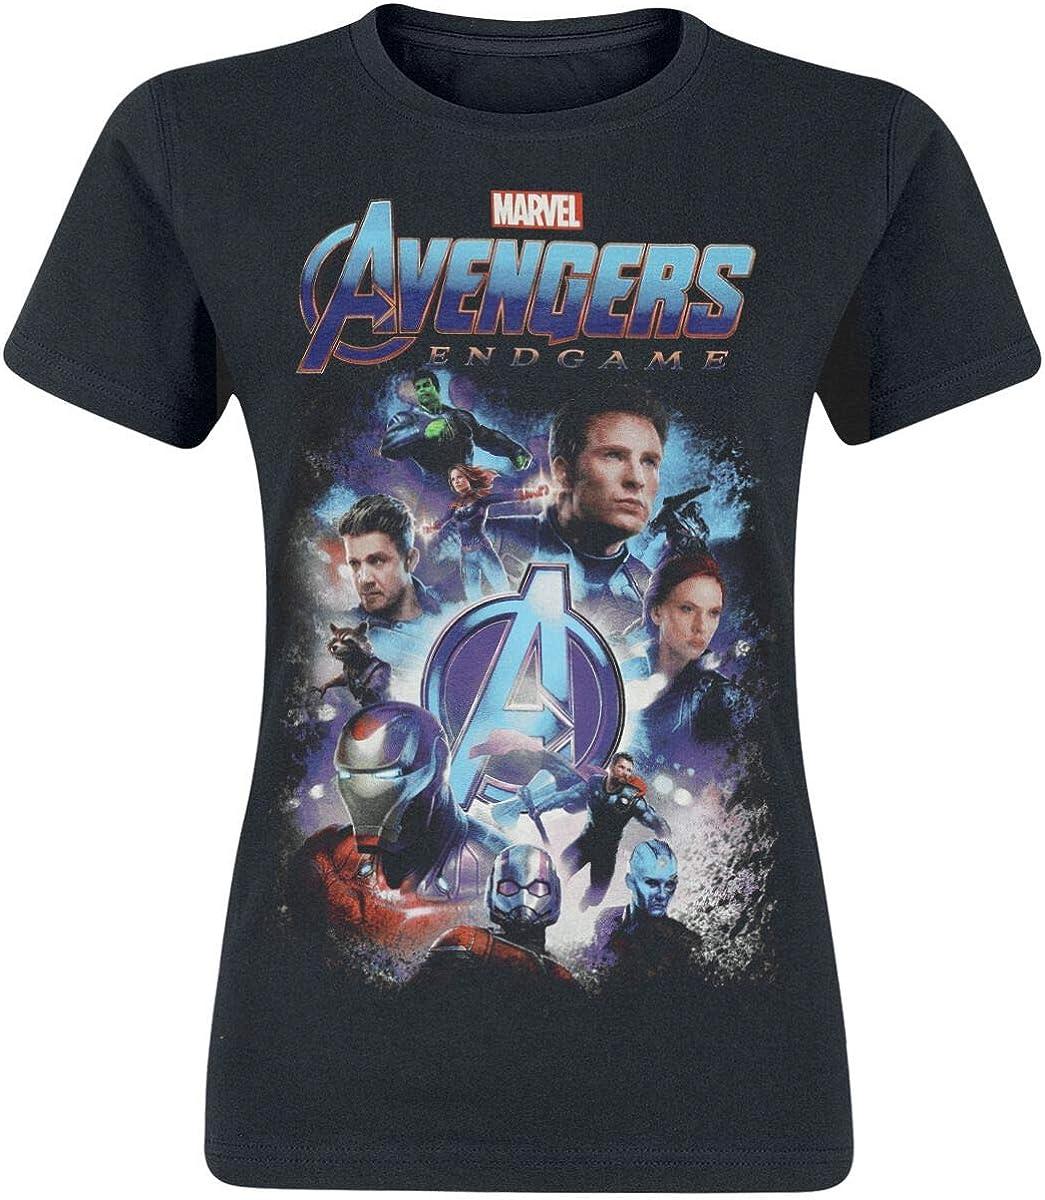 Avengers Camiseta para Mujer Endgame Collage Marvel Cotton Black: Amazon.es: Ropa y accesorios